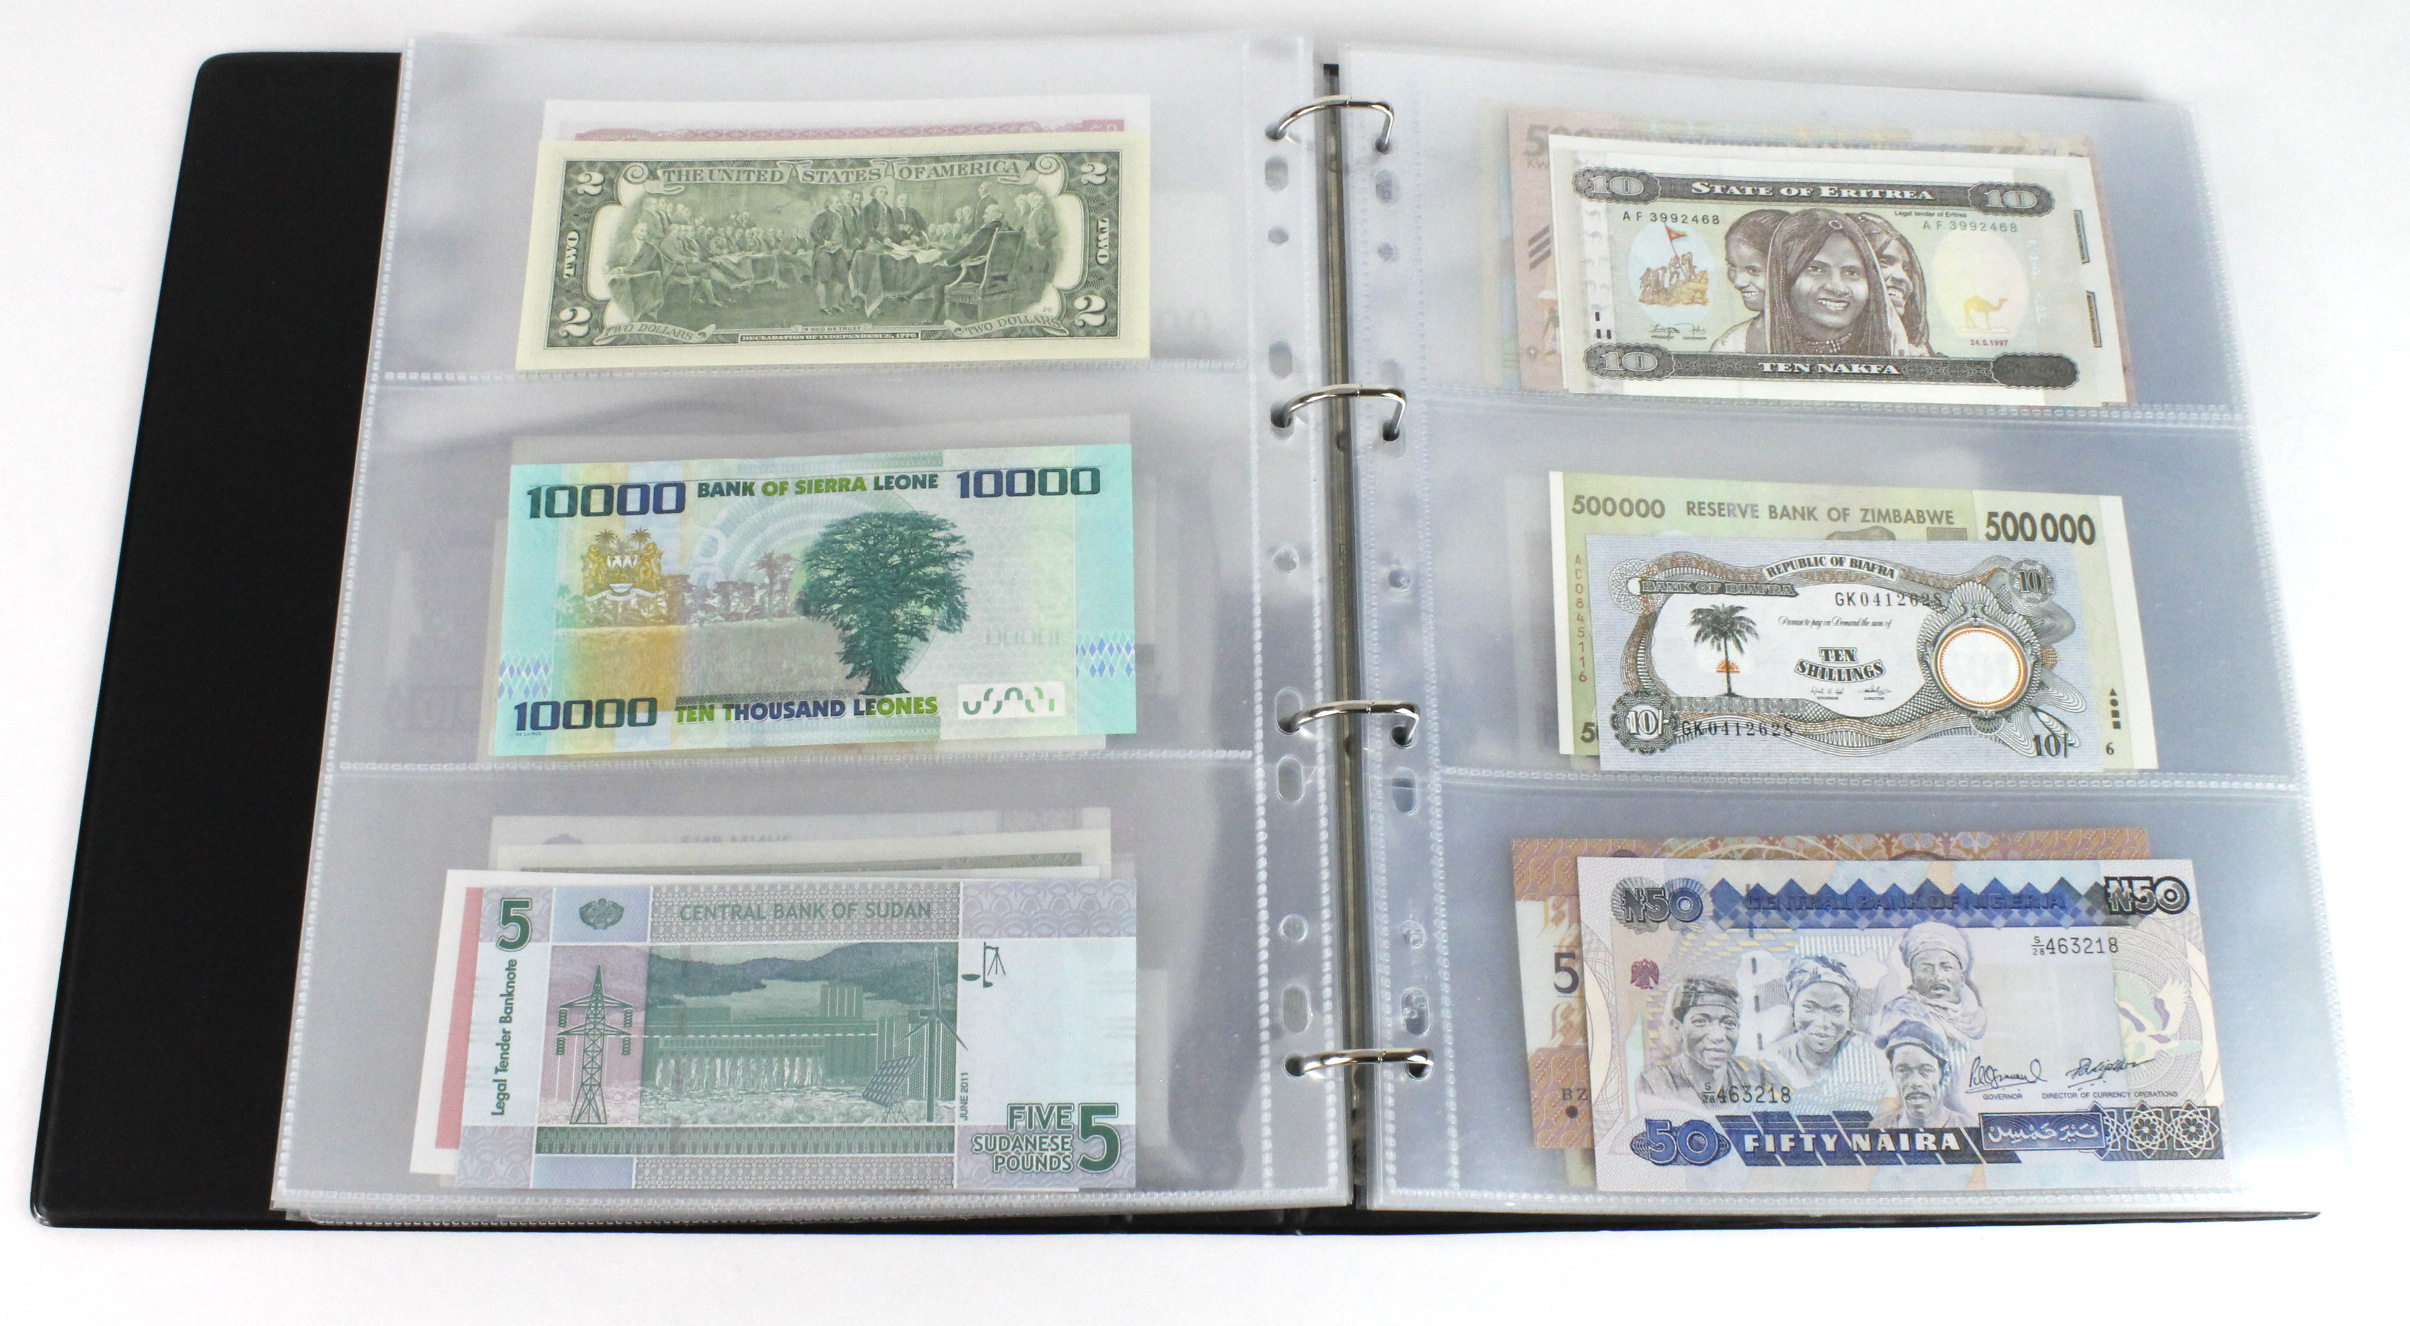 World (163), in banknote album including Bahamas, Spain, Sweden, Netherlands, Algeria, Macau, - Image 33 of 57